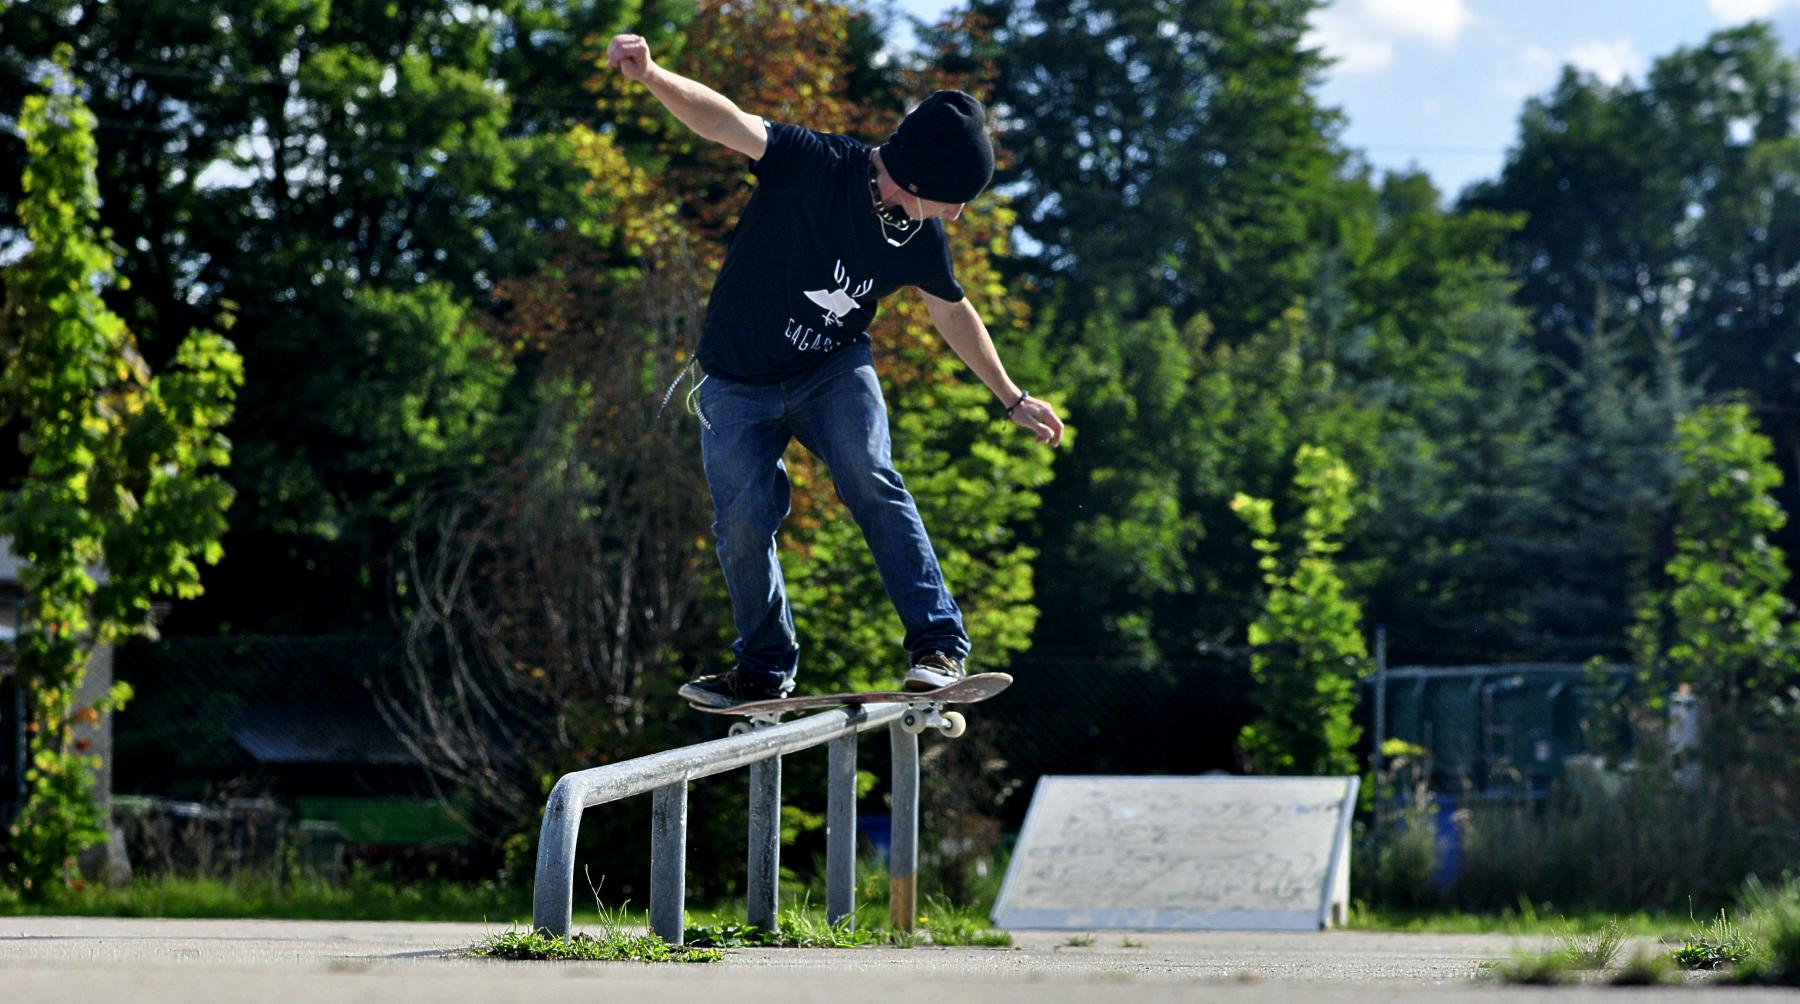 fs-board-up-the-rail